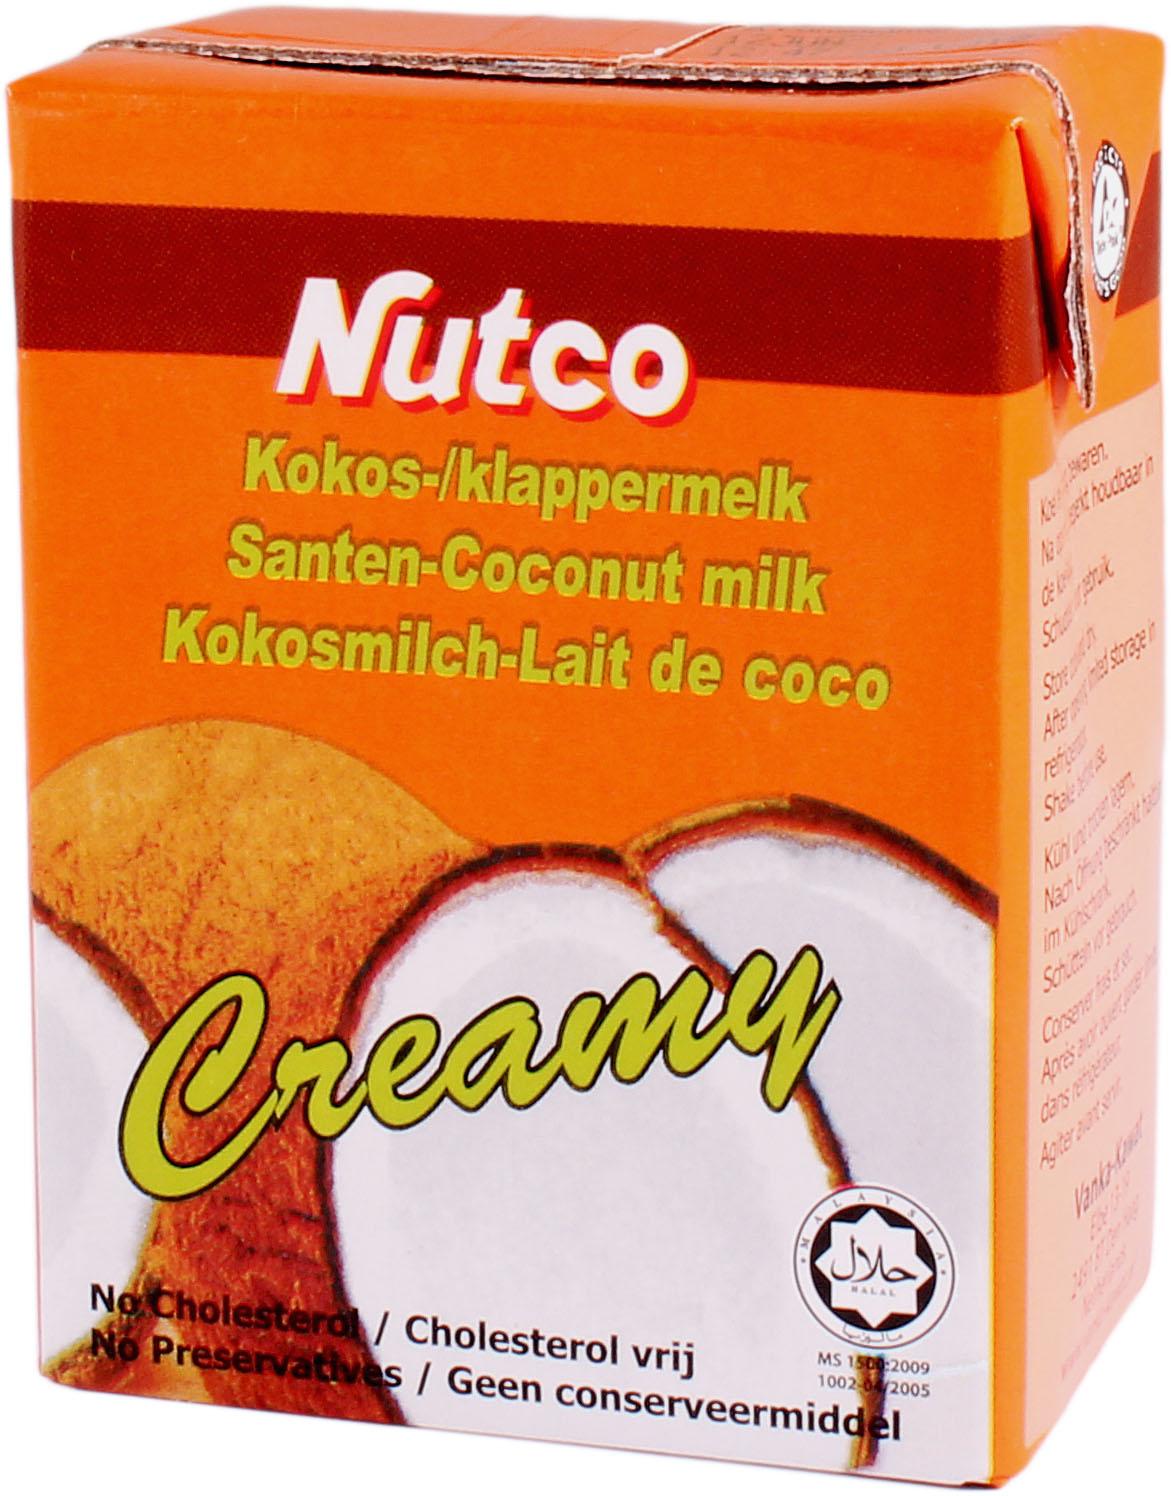 Nutco cocosmelk 200ml